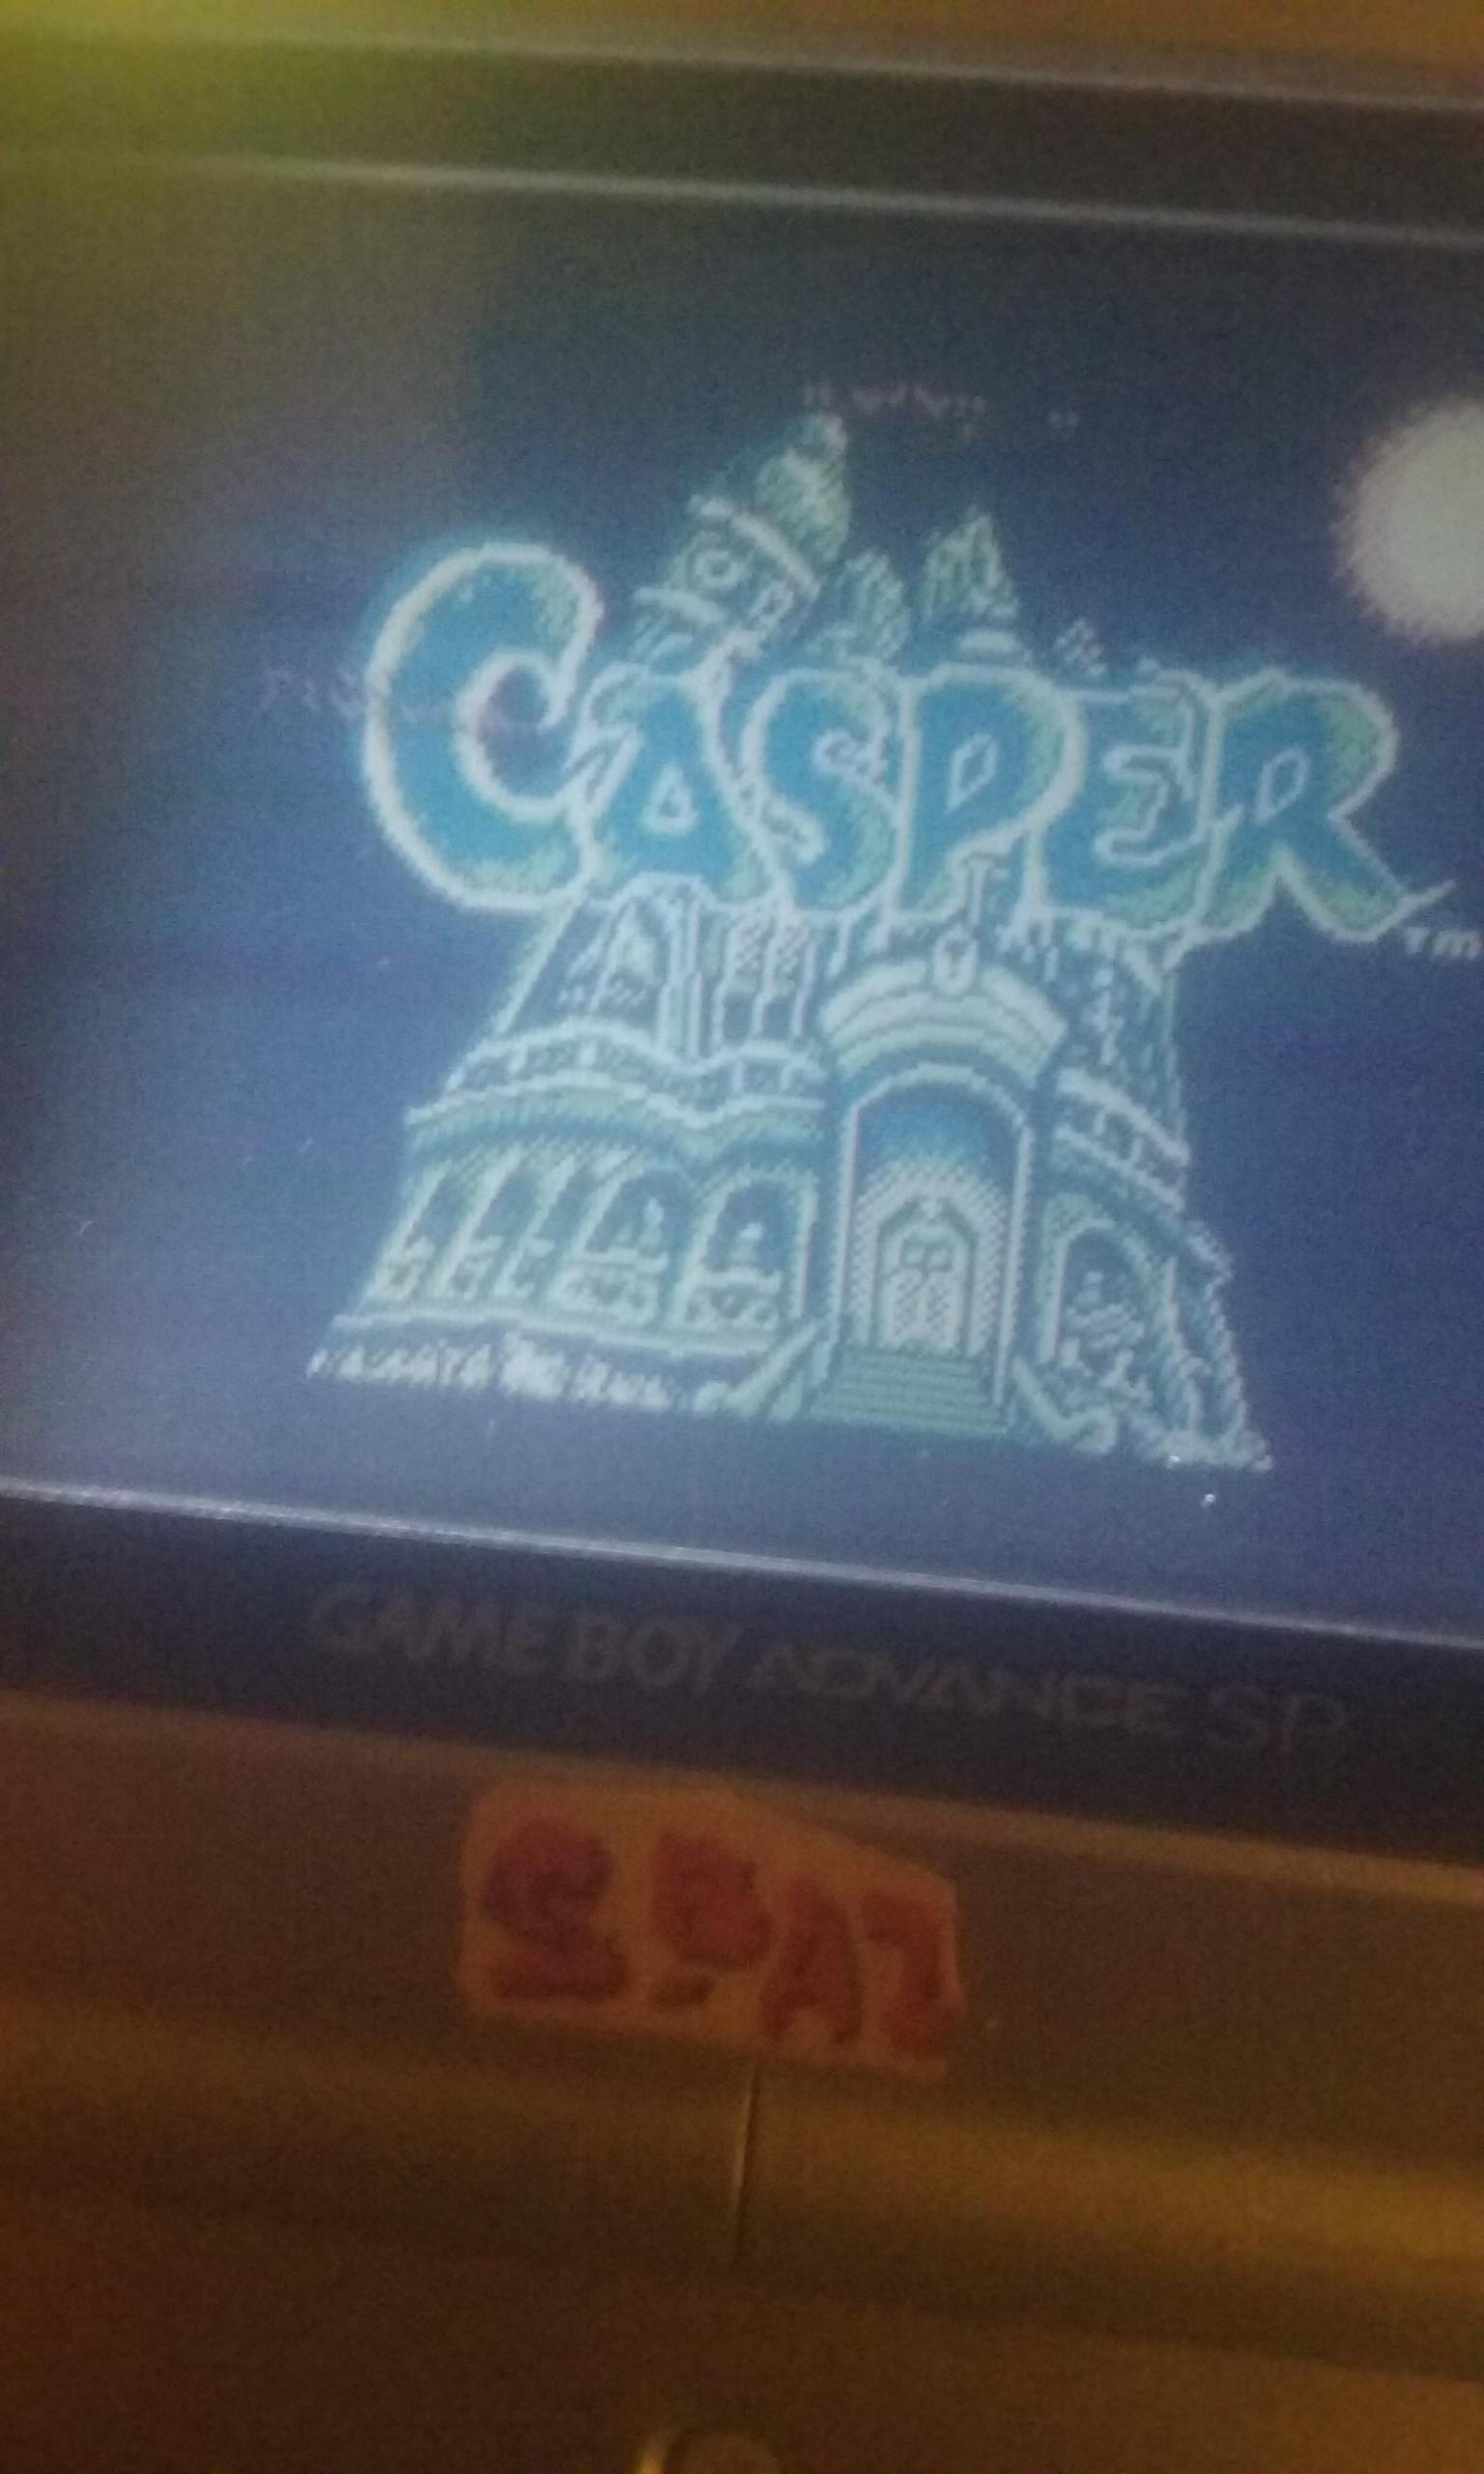 S.BAZ: Casper (Game Boy) 2,030 points on 2019-07-21 20:18:28